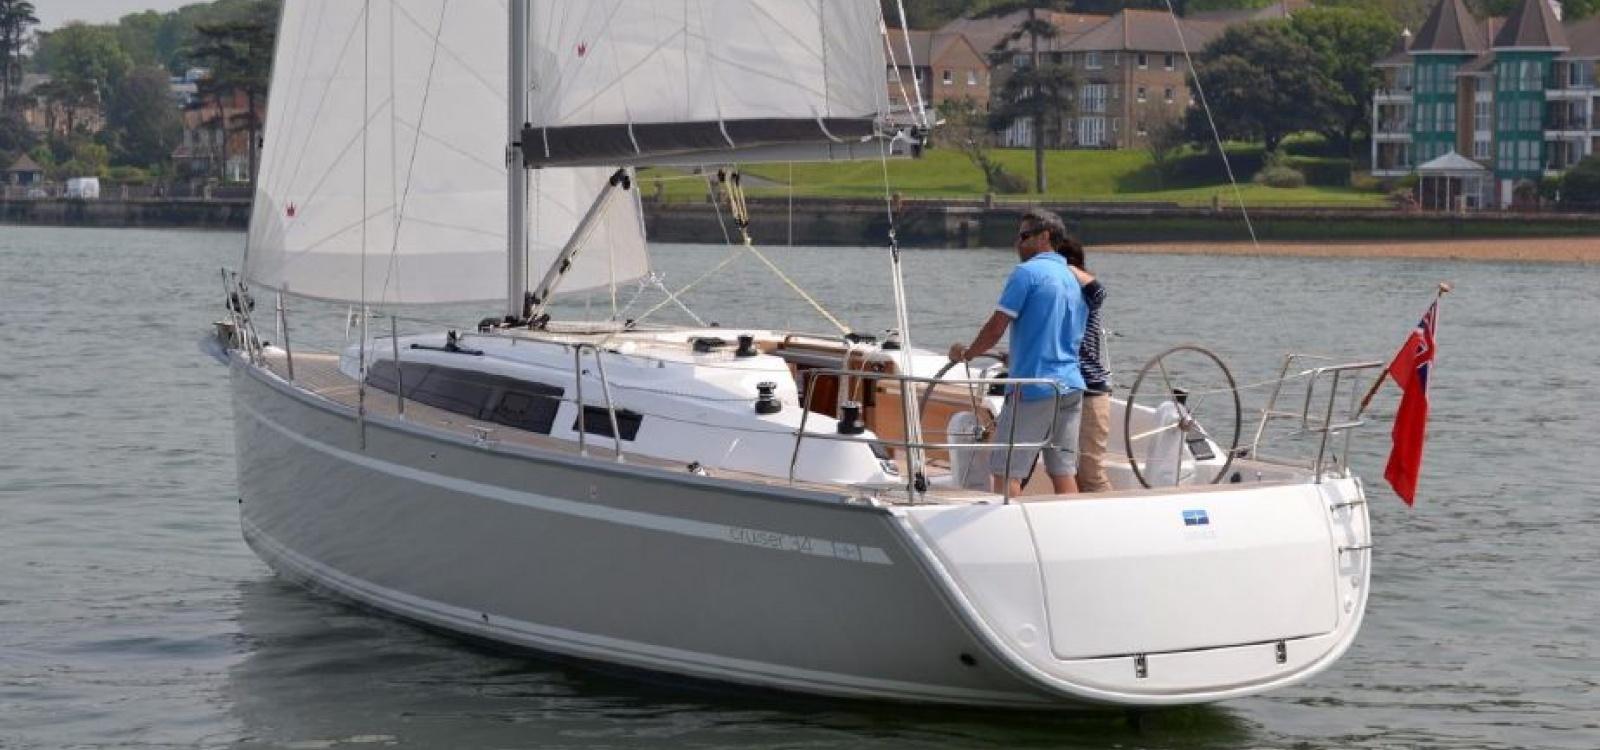 Bavaria cruiser 34 nuevobarco de ocasi n grupo stay for A line salon corte madera